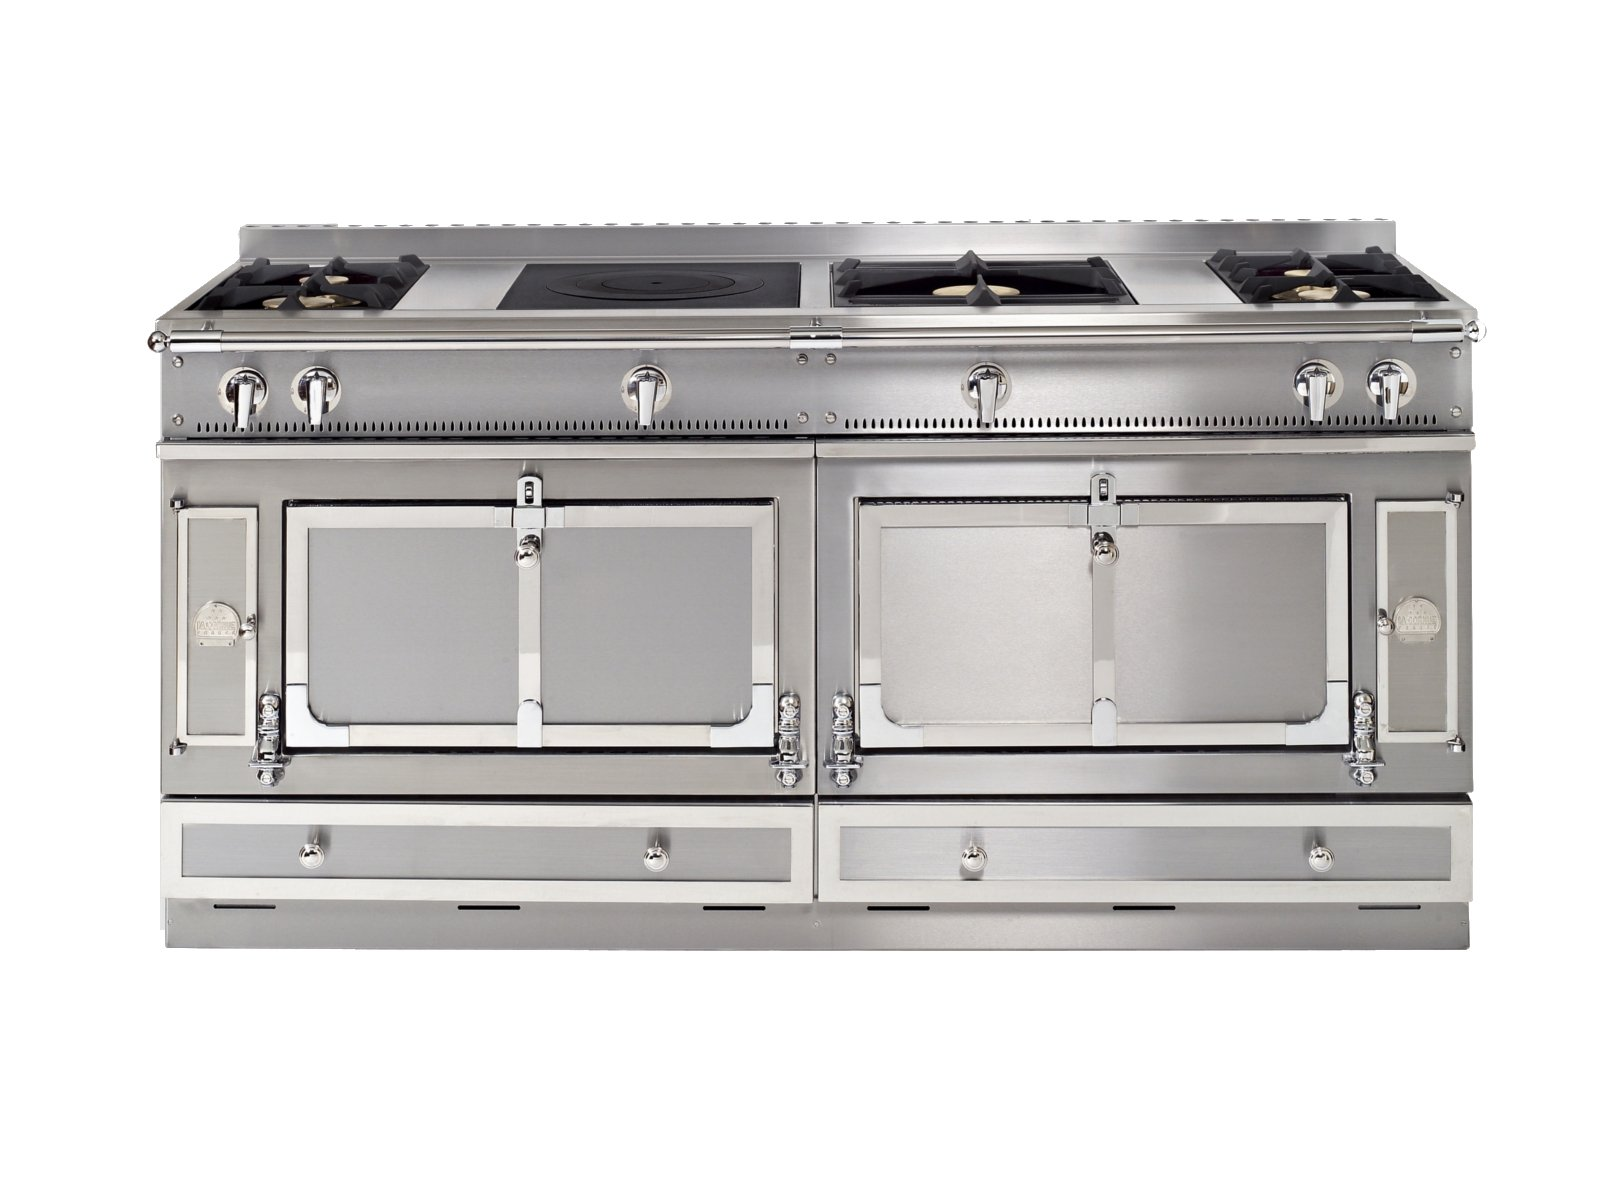 Cooker CHATEAU By La Cornue